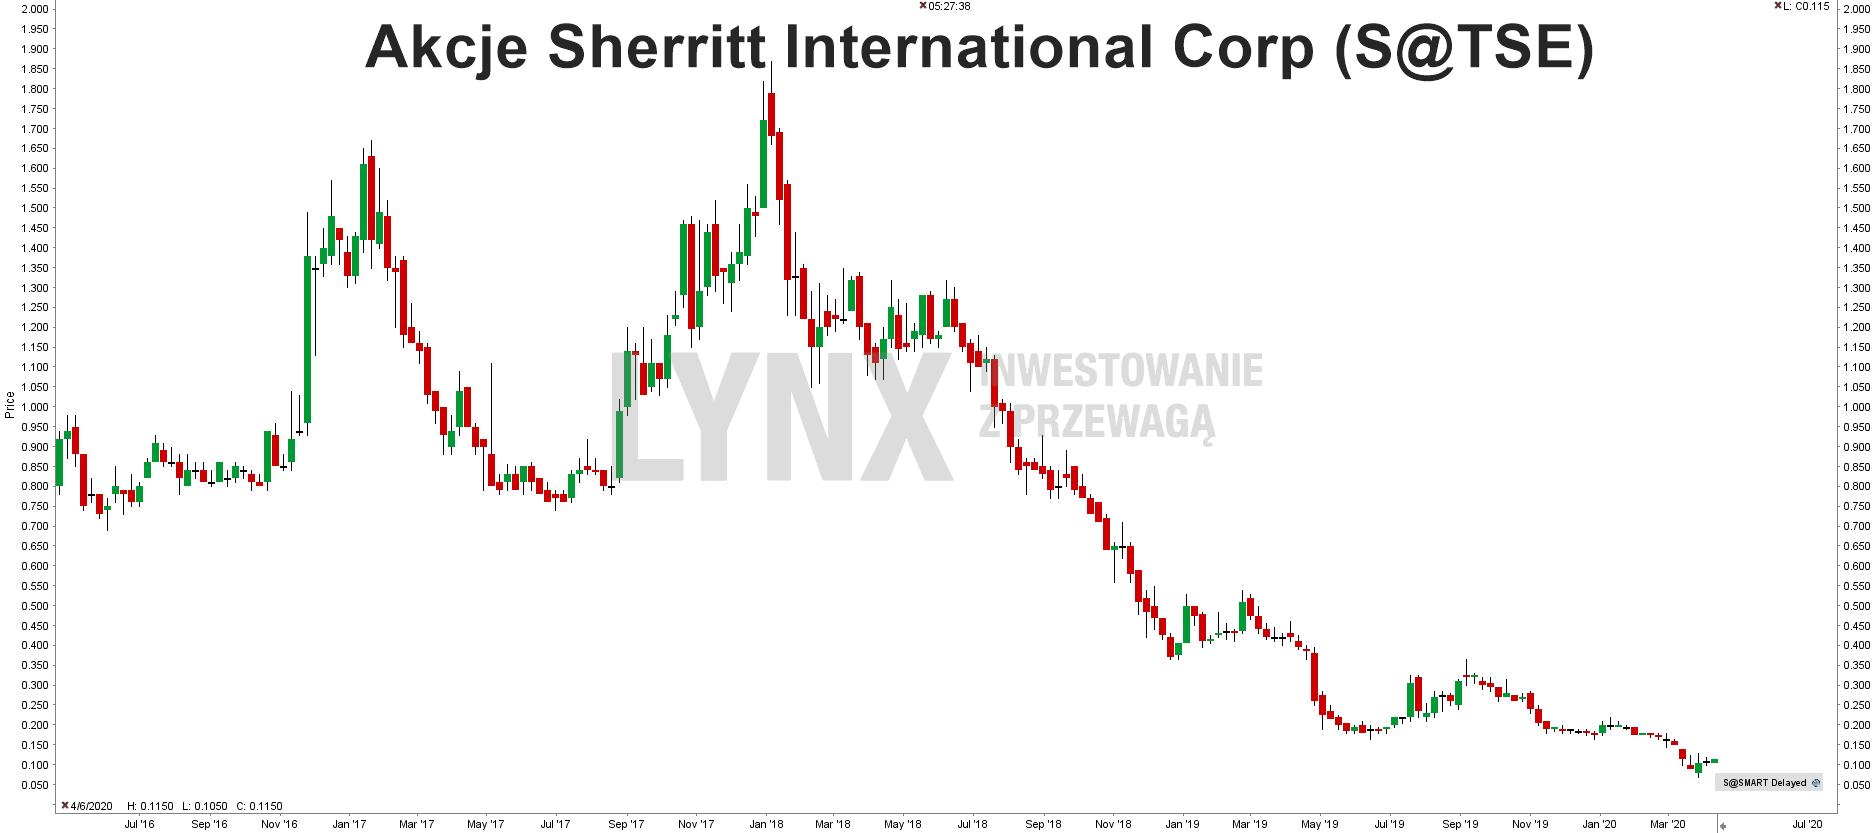 Akcje Sherritt International